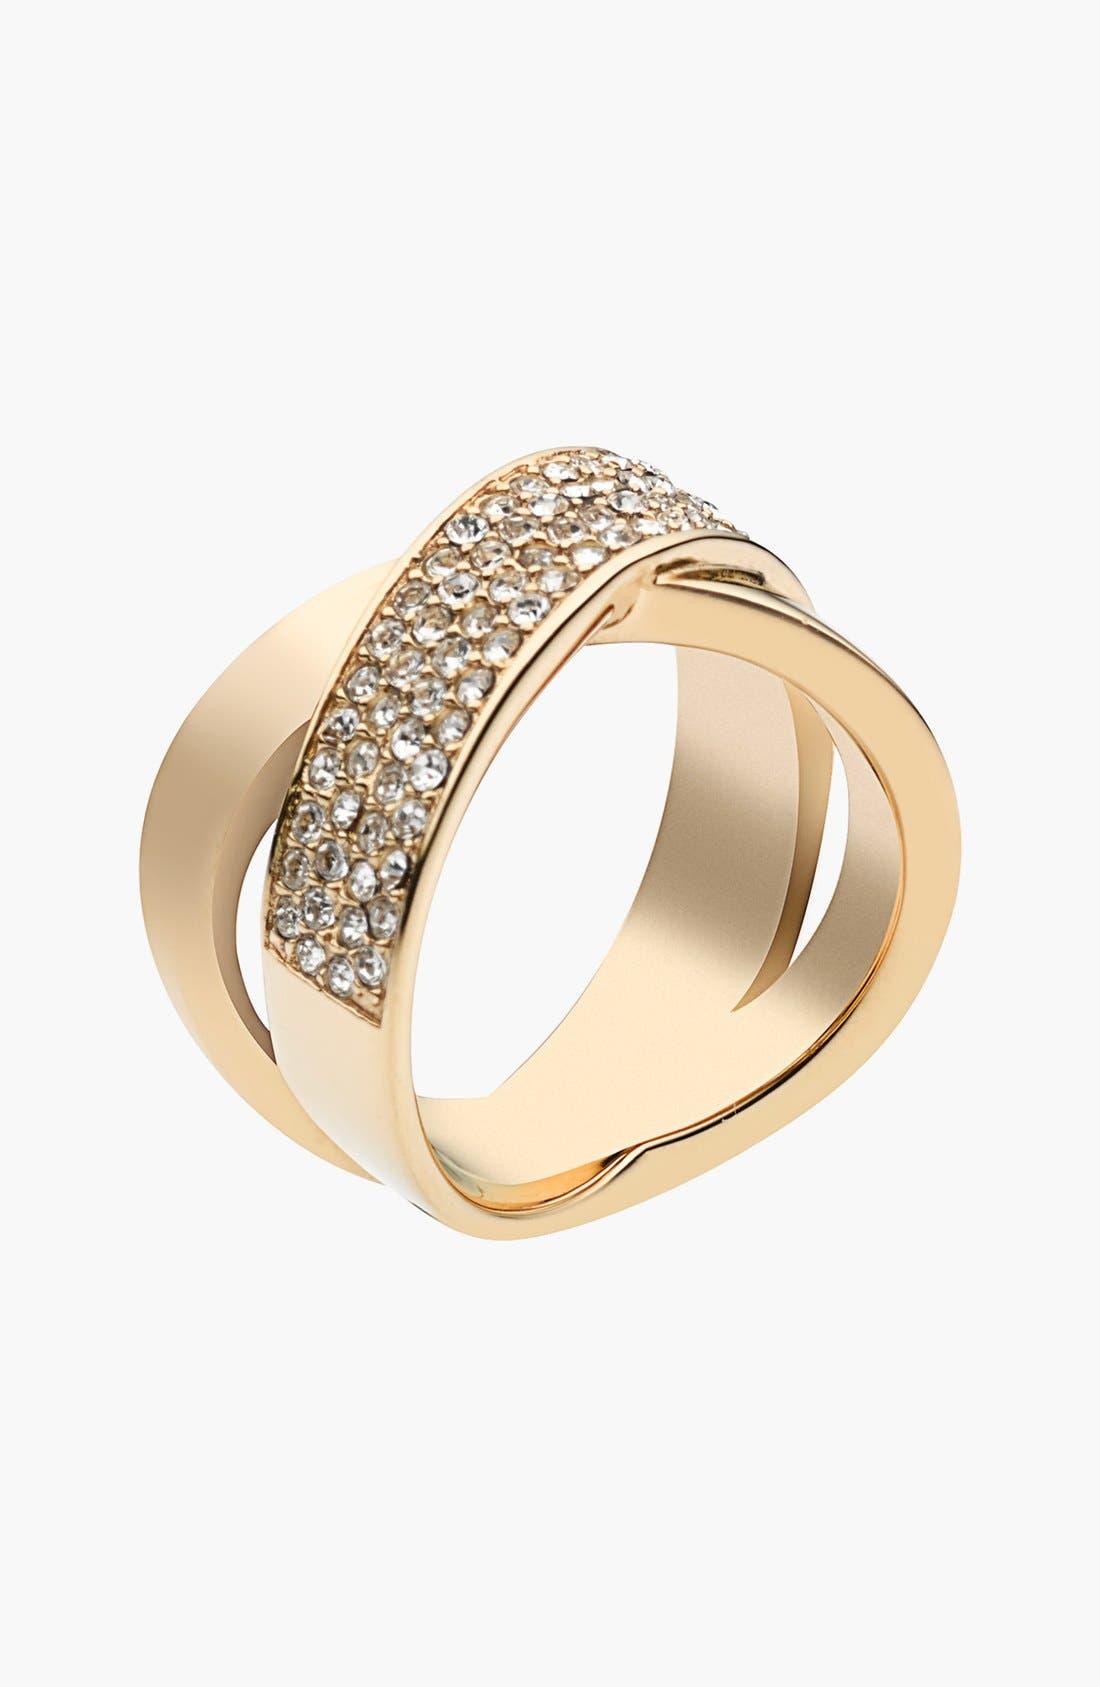 Main Image - Michael Kors 'Brilliance' Crisscross Ring